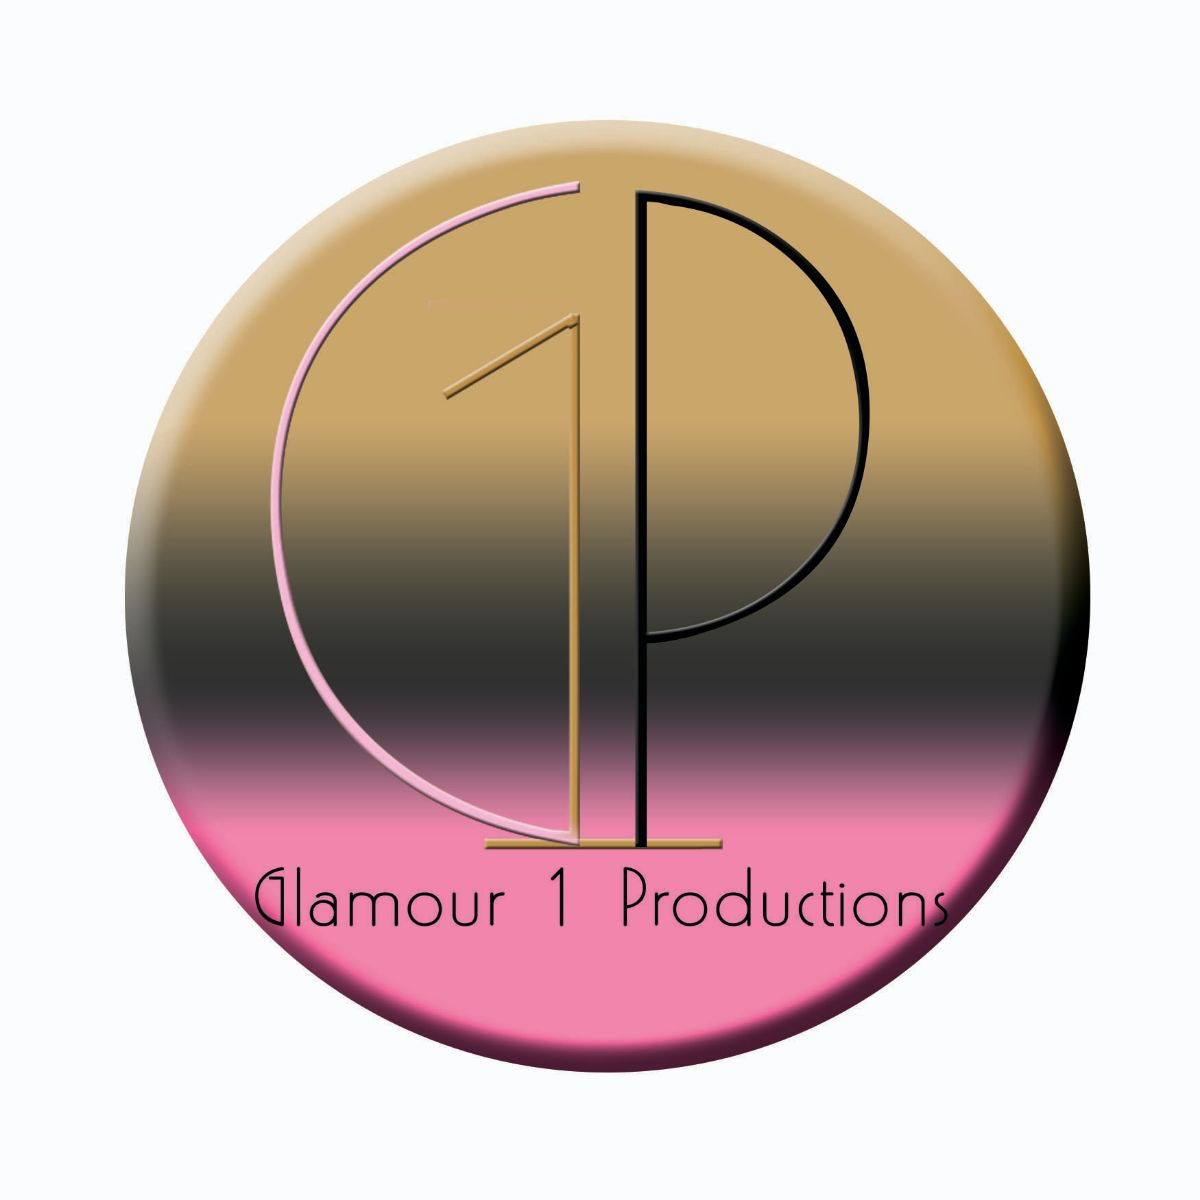 Glamour 1 Productions LLC